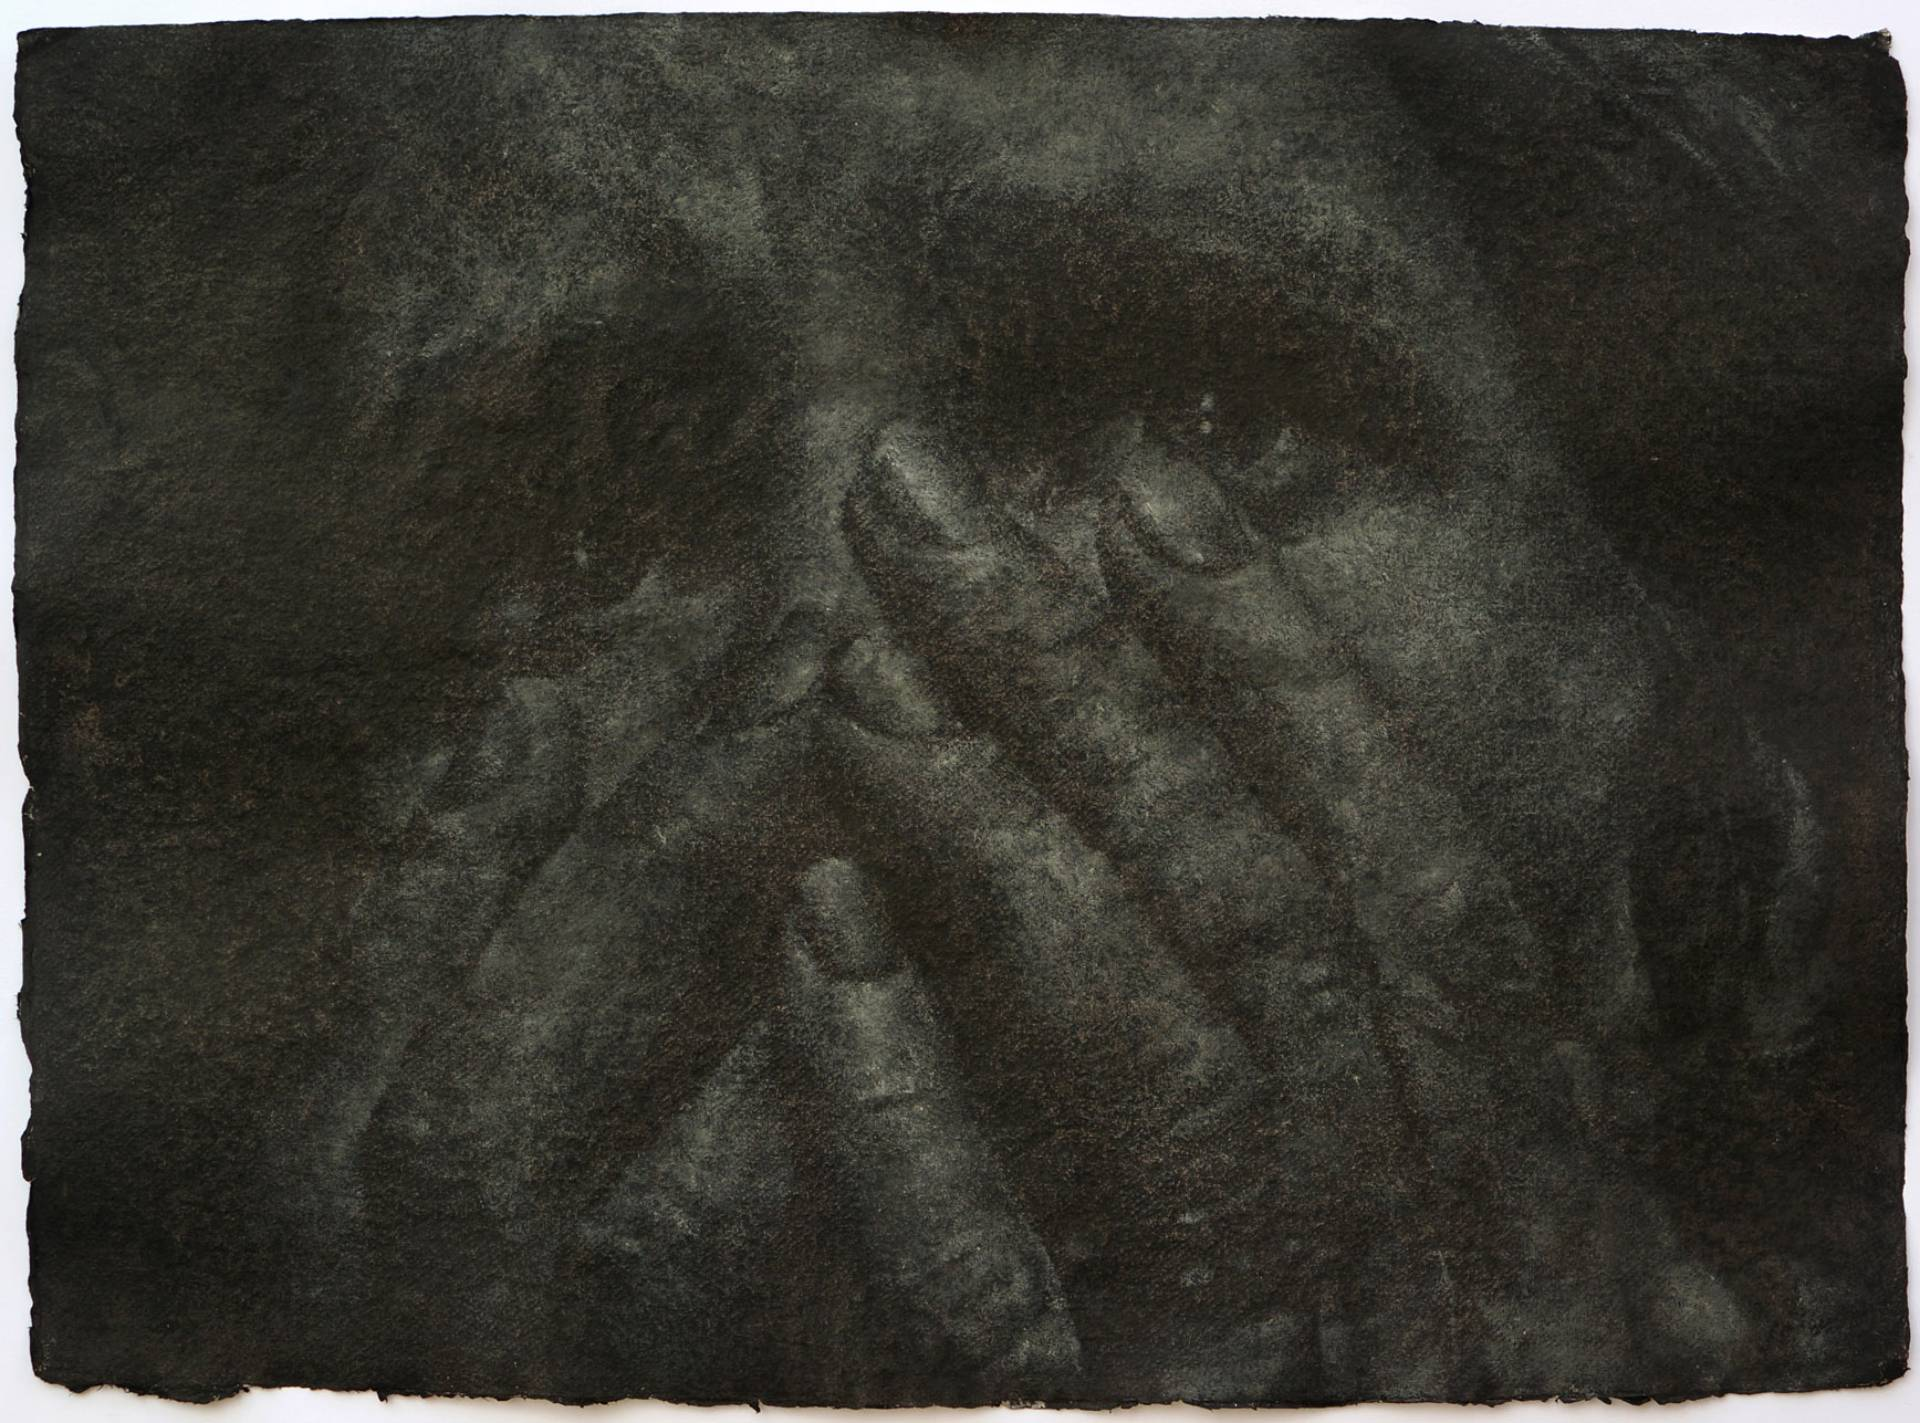 Vargtimmen no.6, 56x76 cm, El yapımı kağıt üzerine yağlıboya, 2015